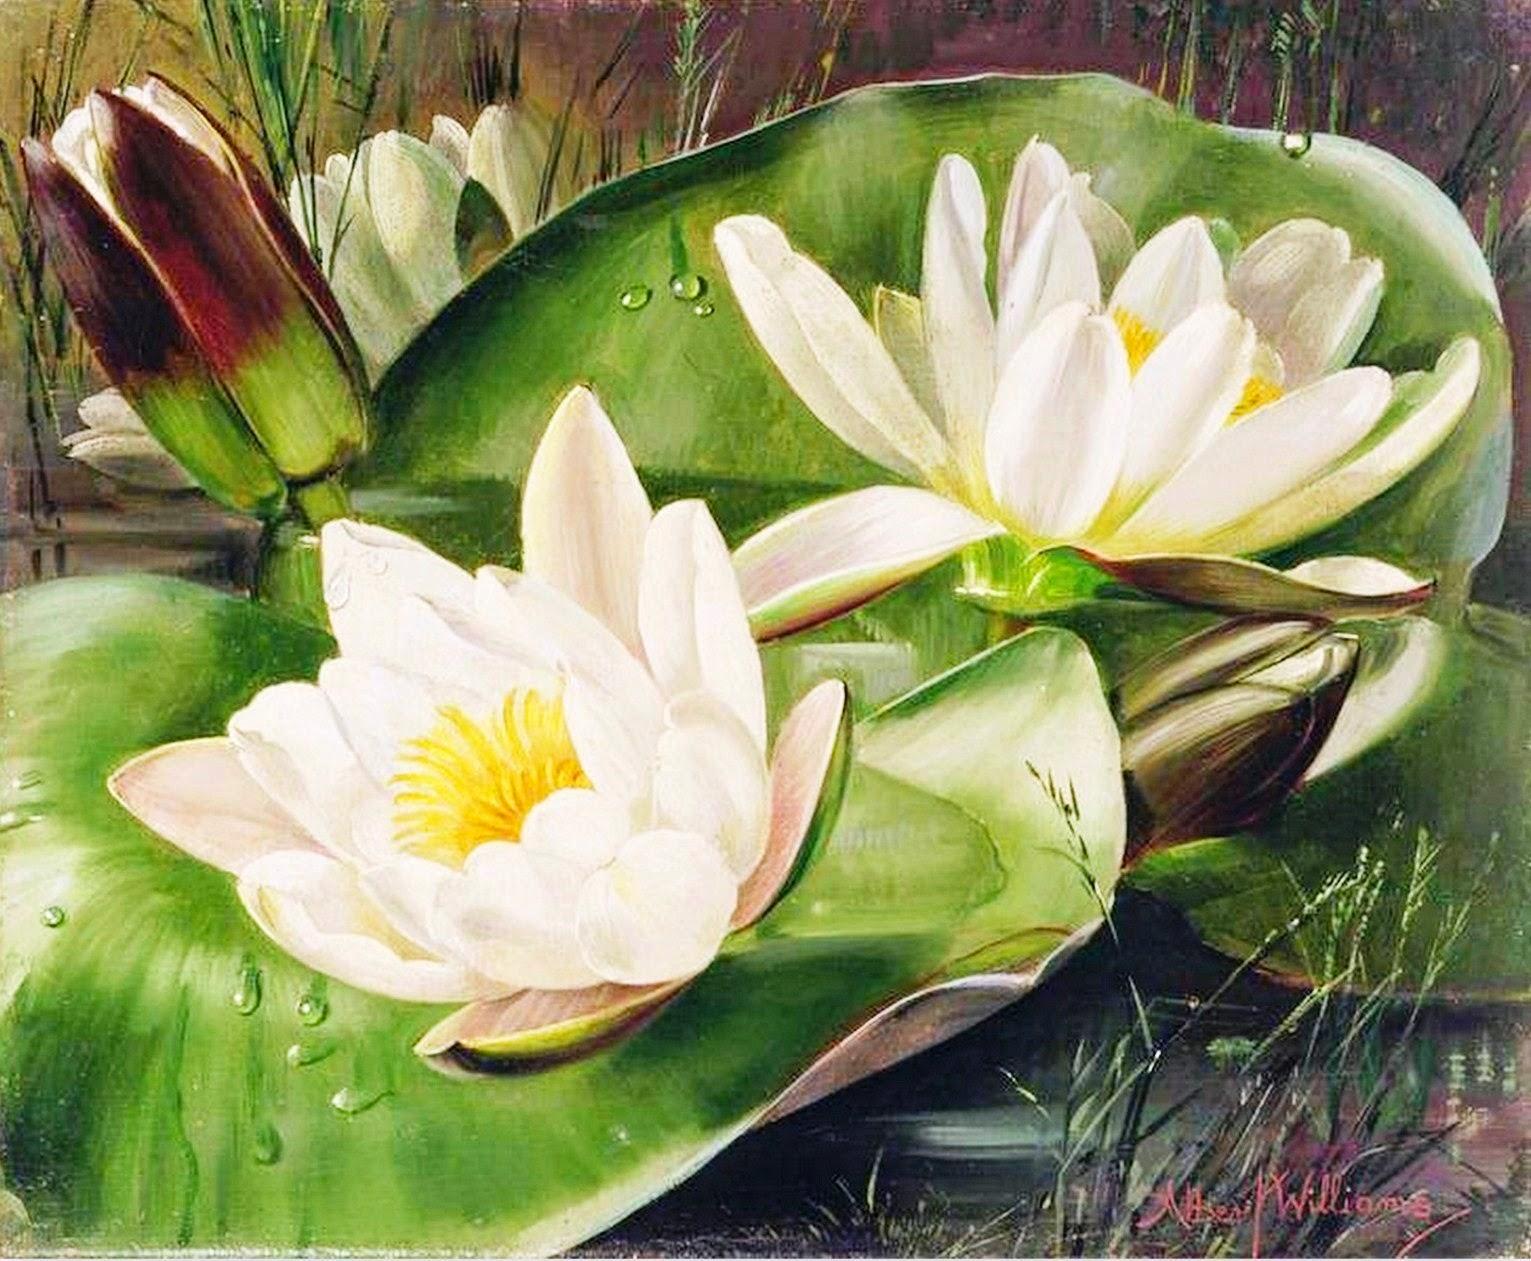 Pintura al oleo como pintar flores diy flowers painting for Cuadros pintados al oleo